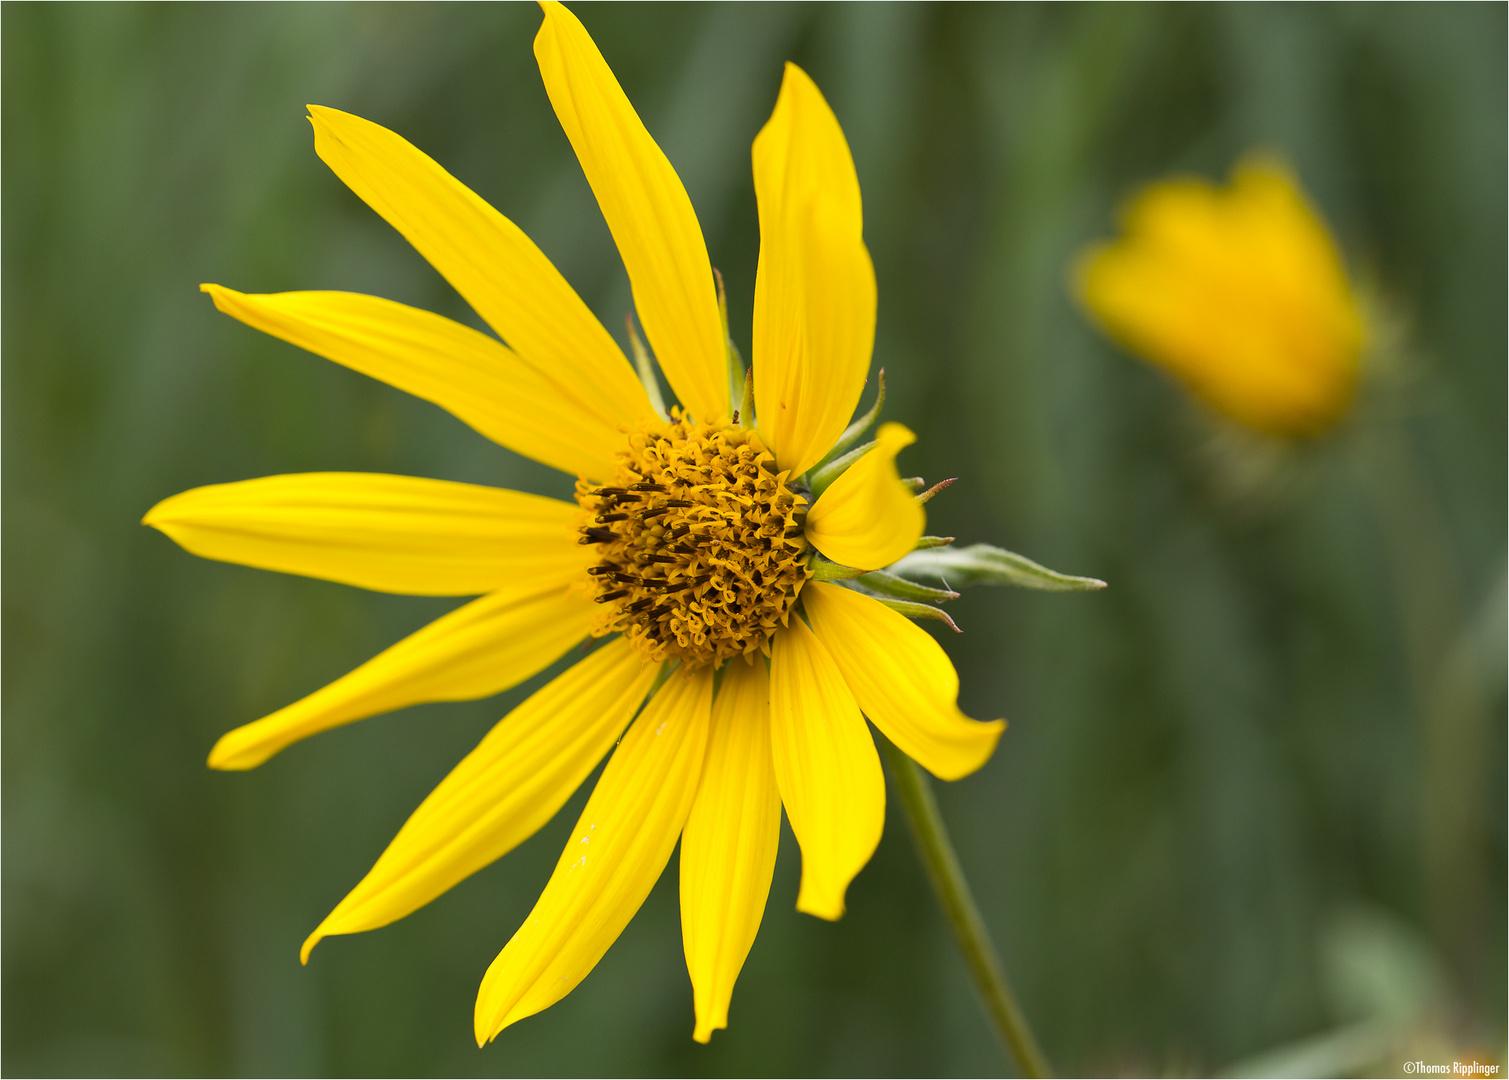 Riesen - Sonnenblume (Helianthus giganteus)